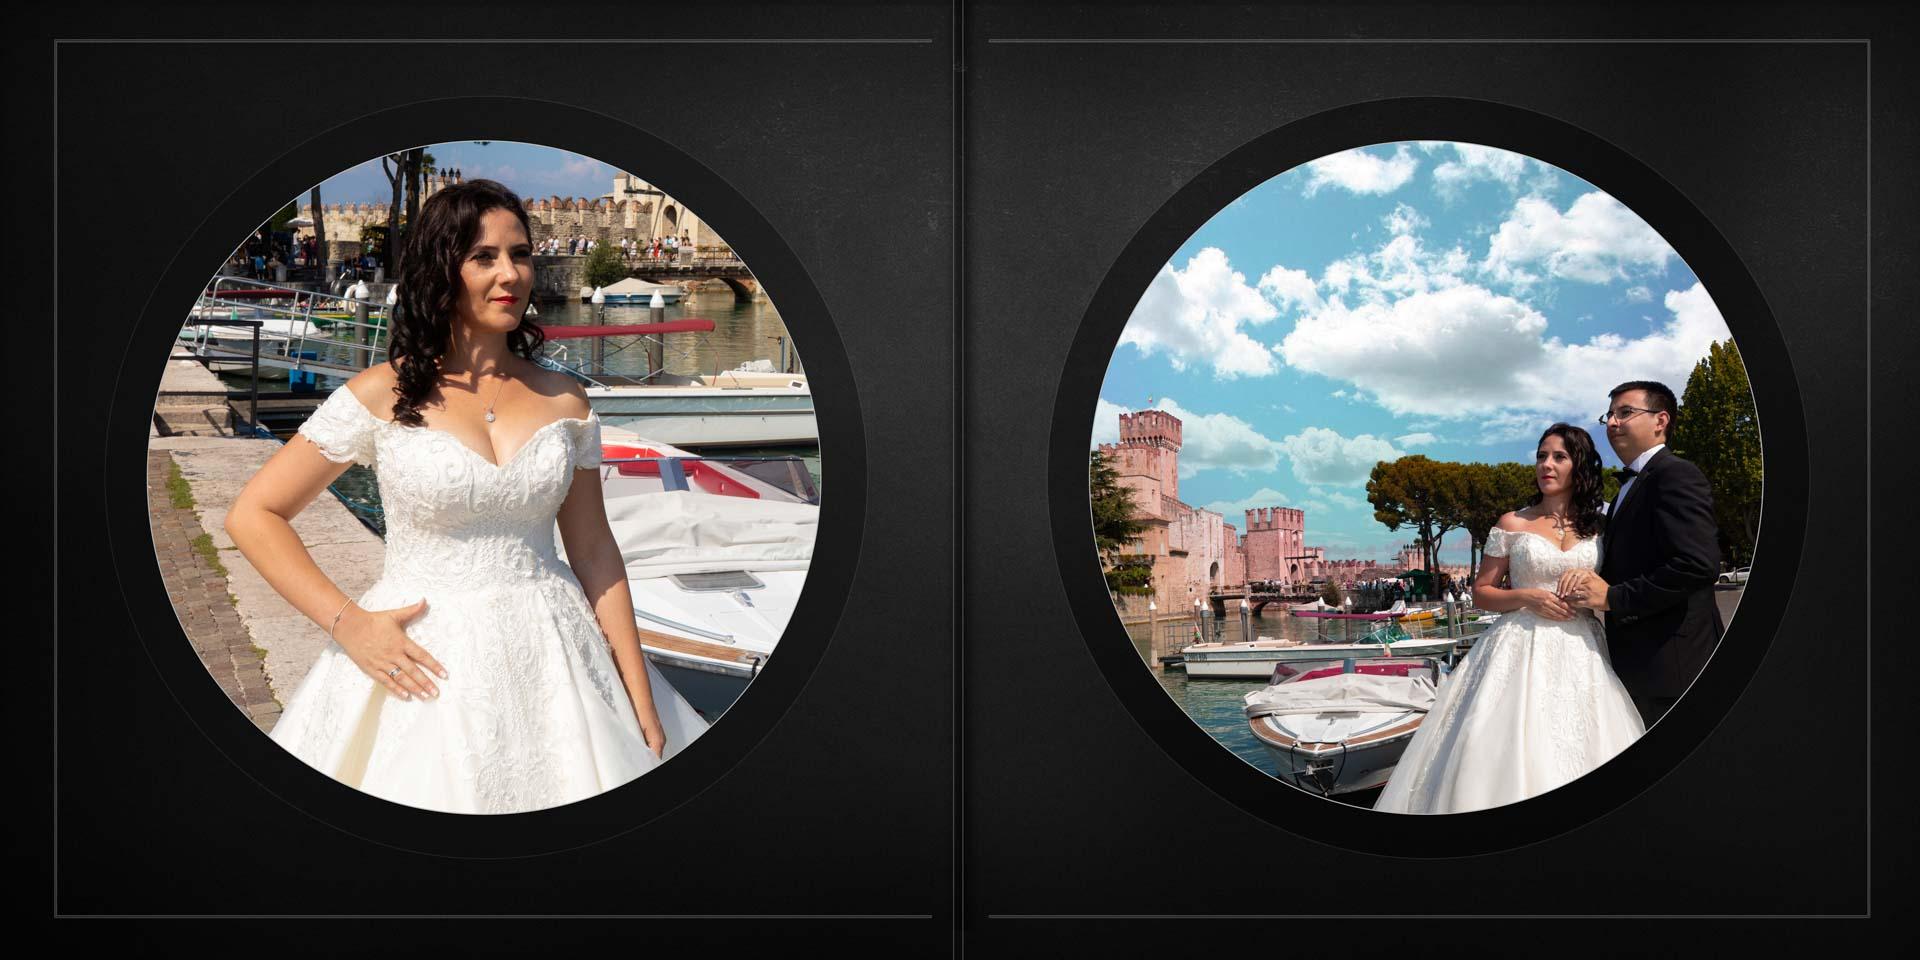 photo-revolution-diana_cristian-album_design-11